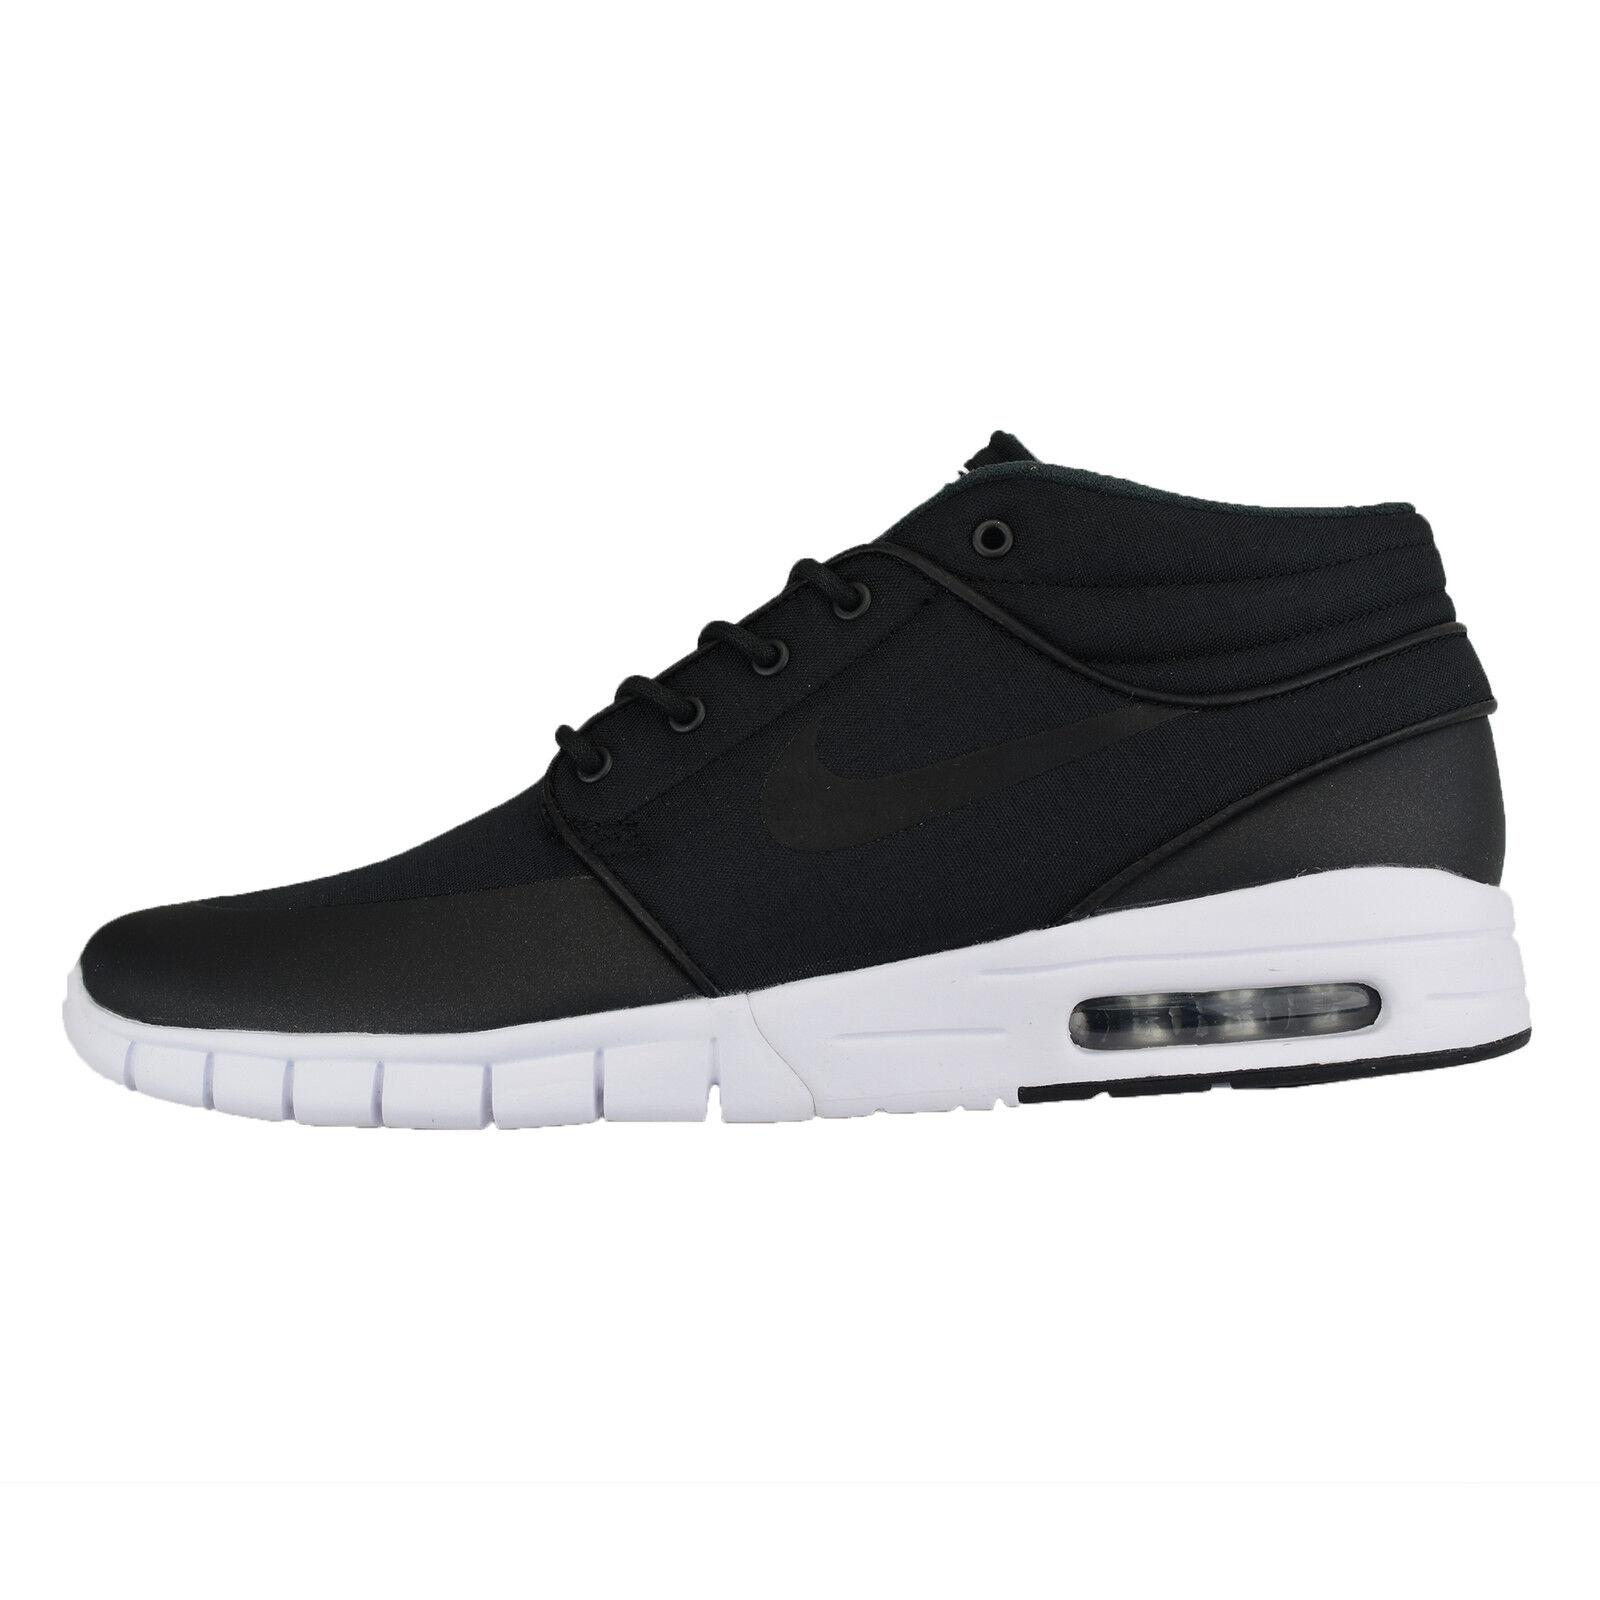 Nike Zoom Stefan Janoski MAX MID 807507-001 Skateboard Lifestyle Schuh Sneaker